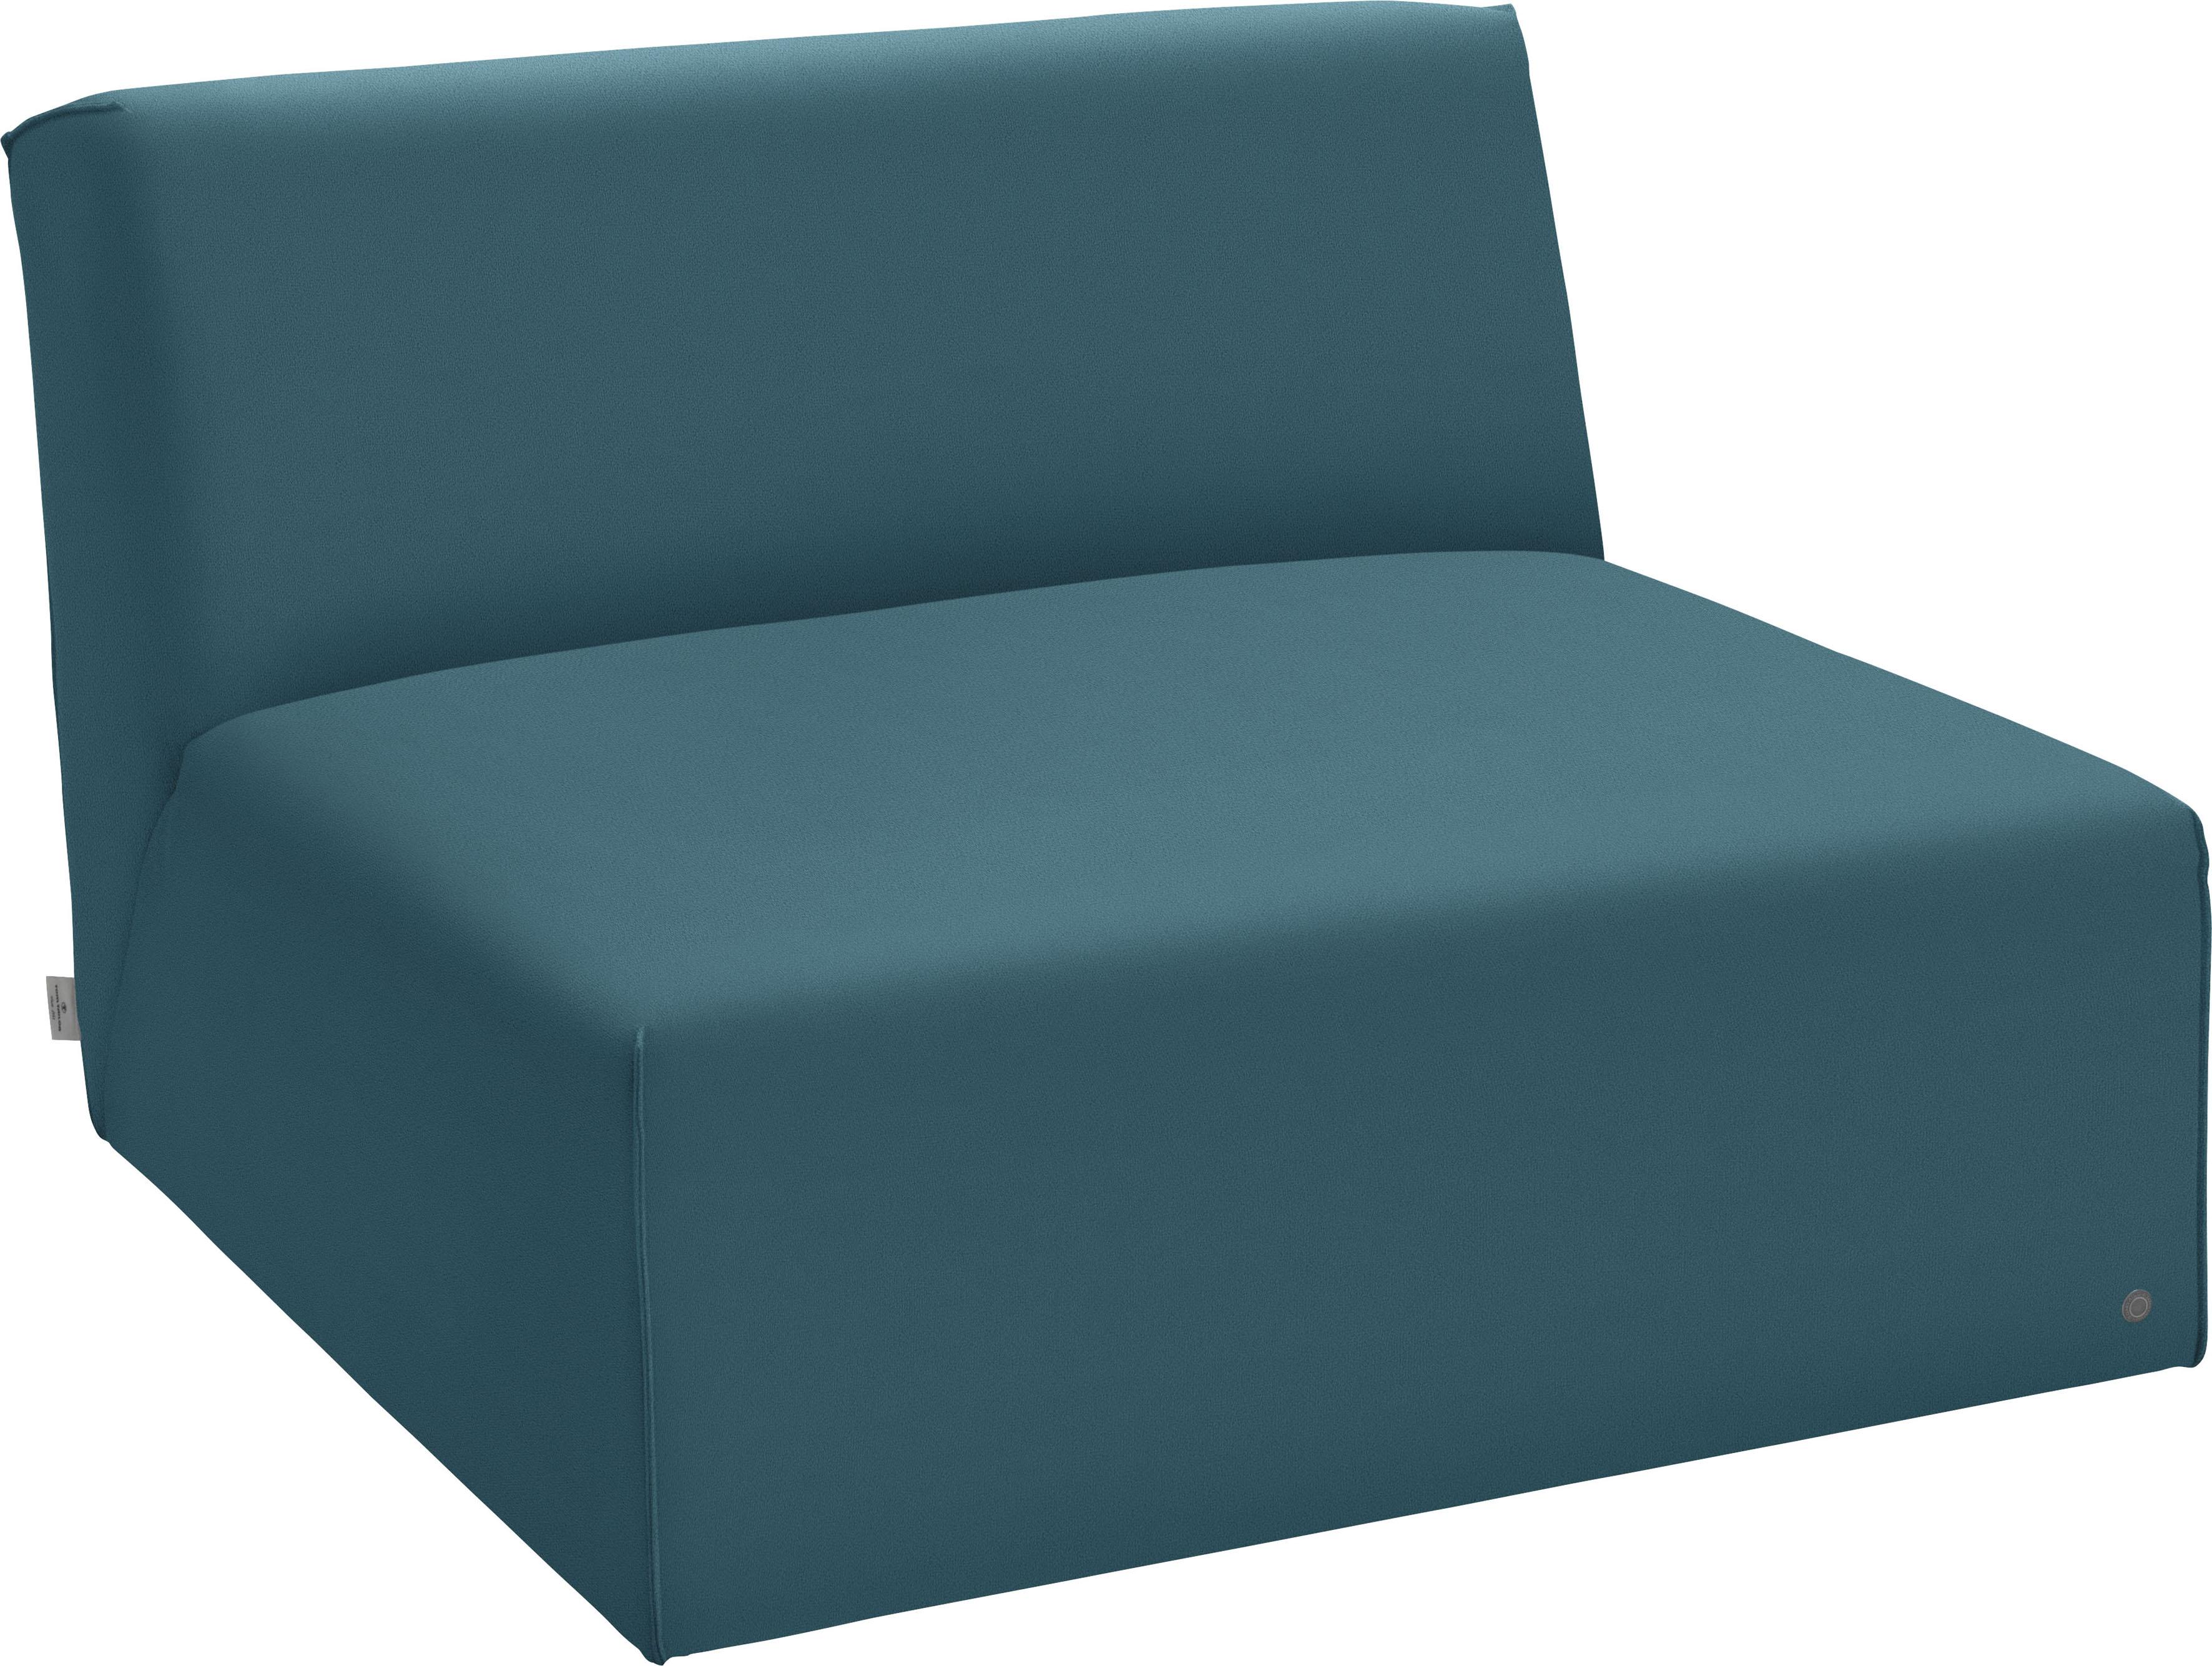 TOM TAILOR Sofaelement ELEMENTS, Sitzelement ohne Armlehne grün Sofaelemente Sofas Couches